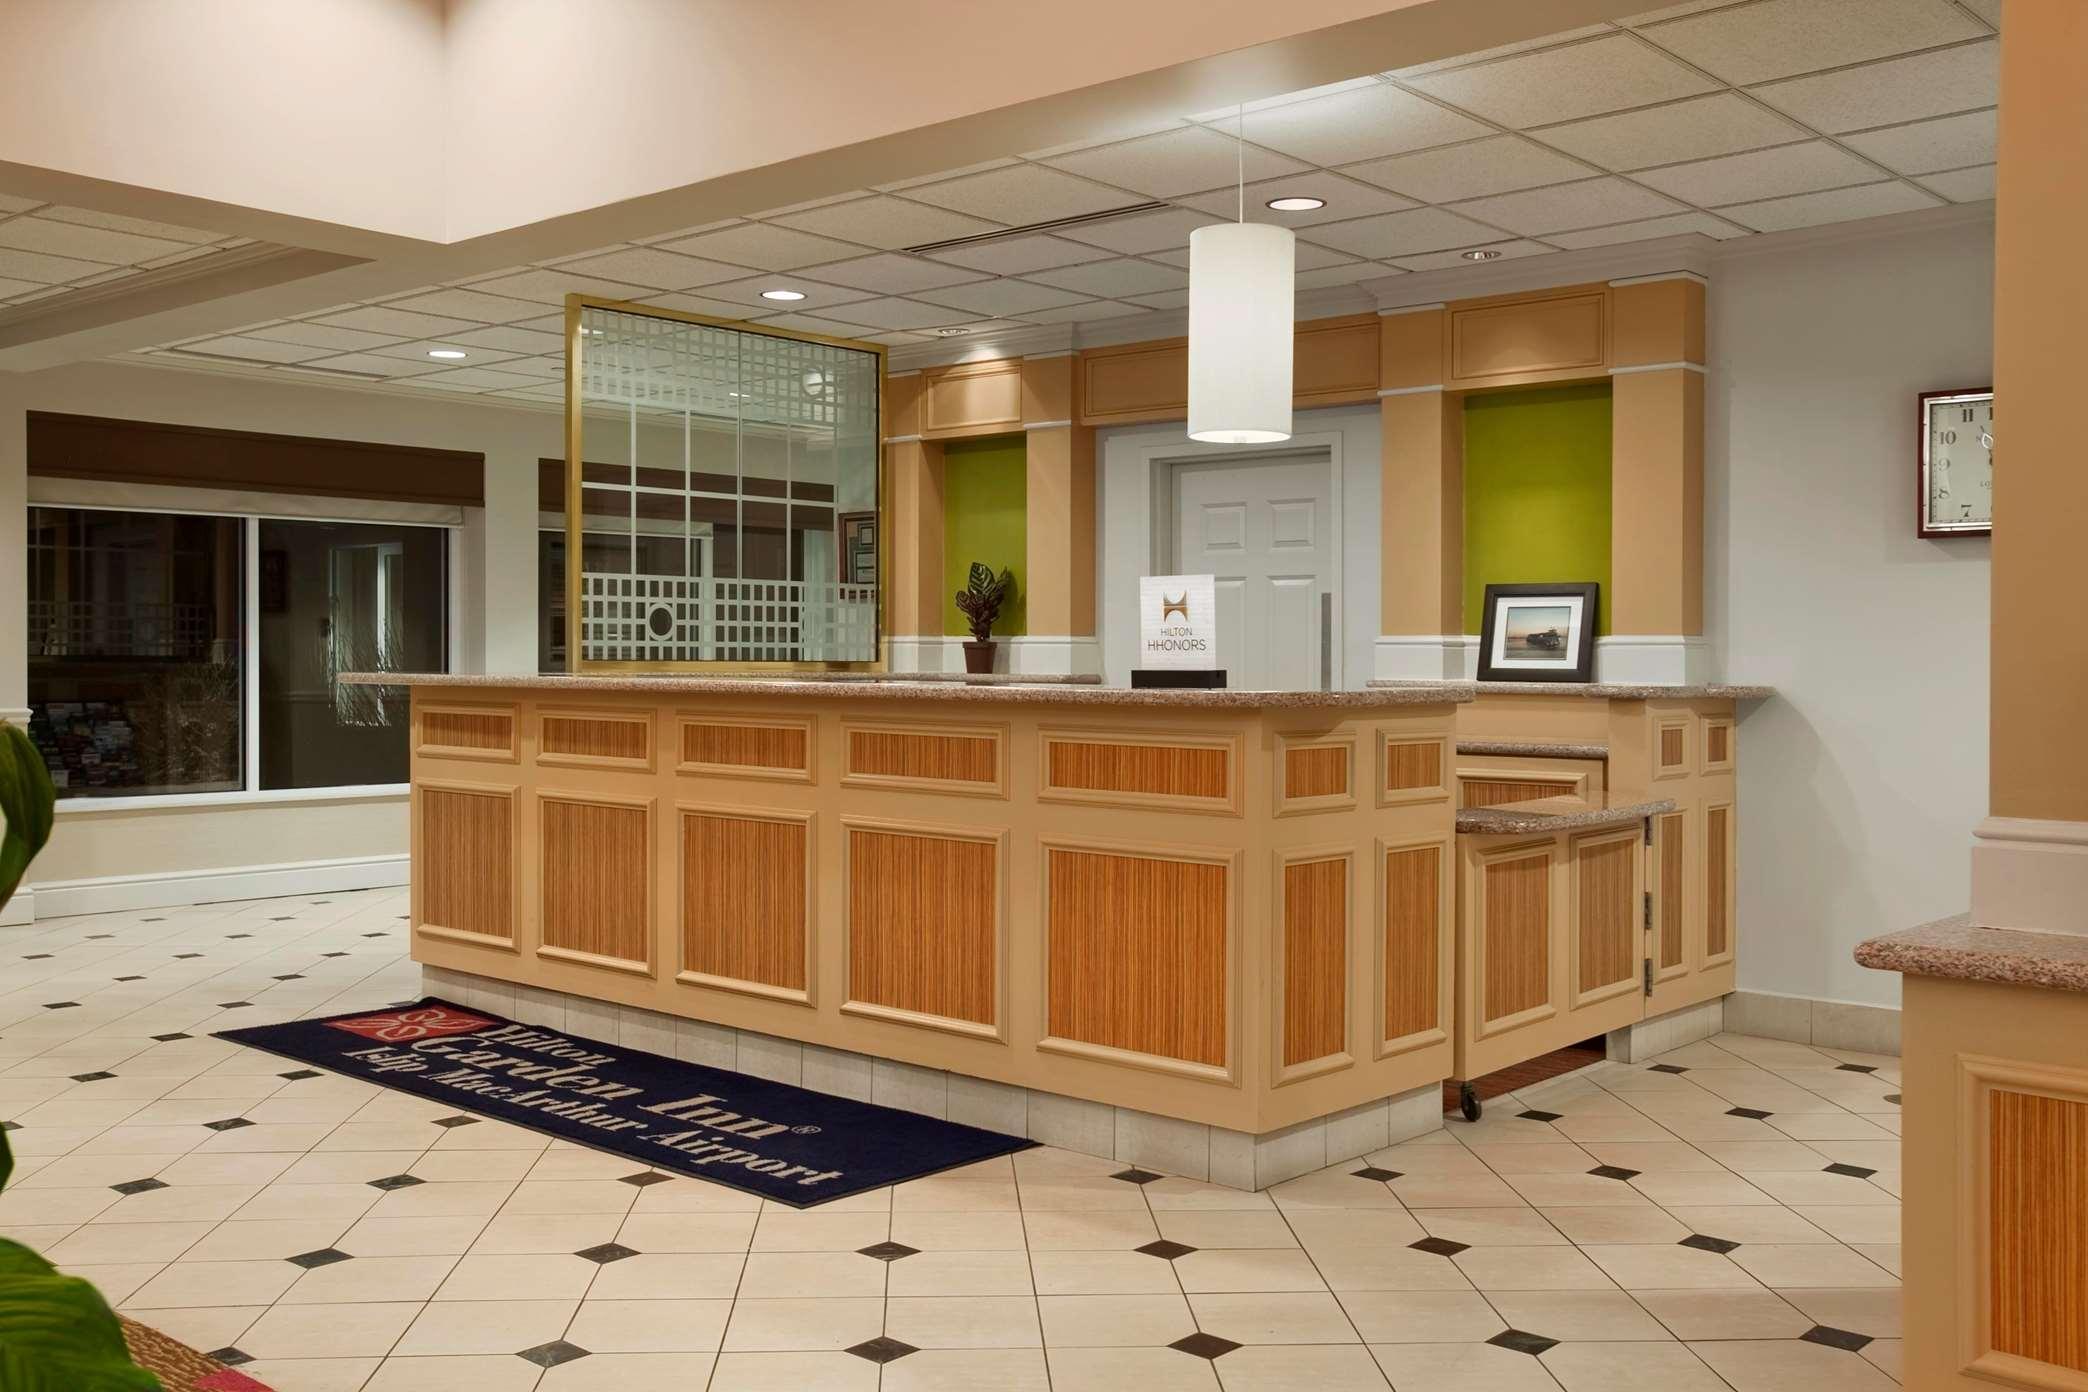 Hilton Garden Inn Islip/MacArthur Airport image 12